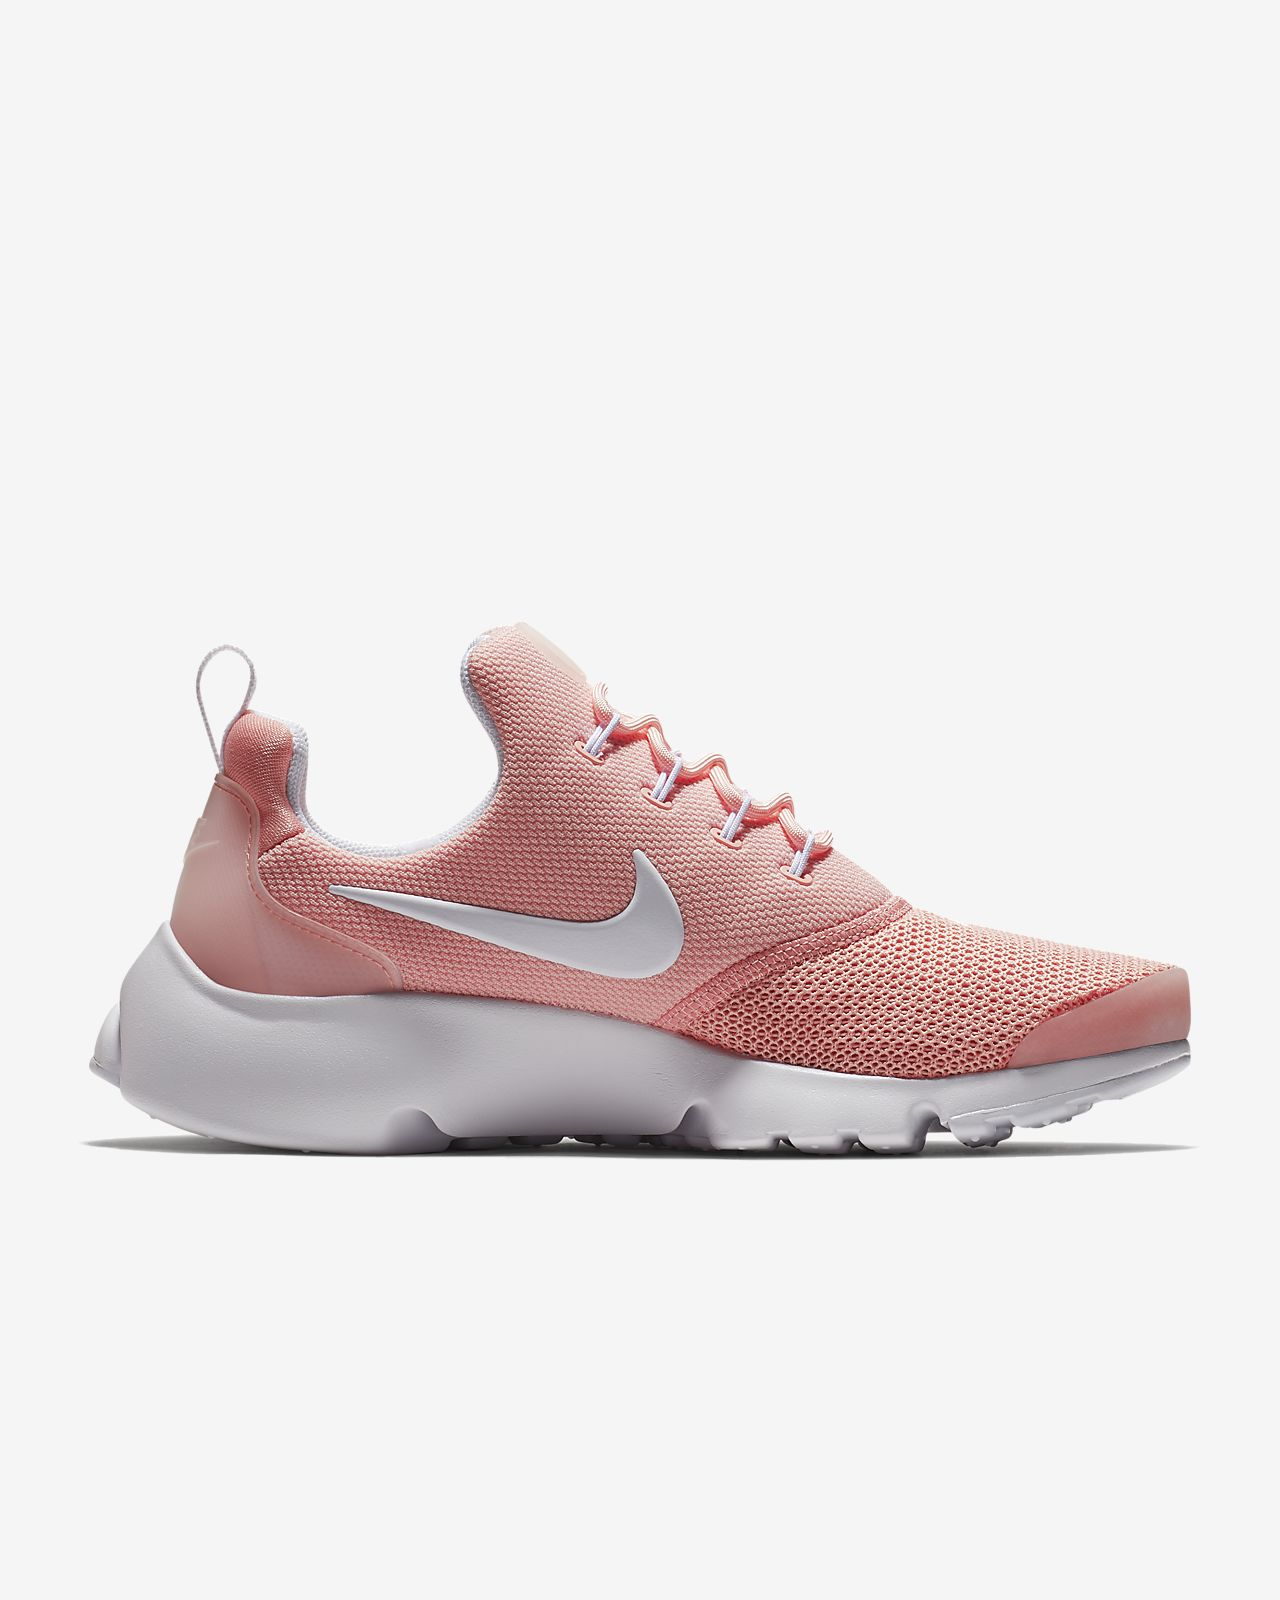 Nike Chaussures Presto Mouche De Blanc Gris OTwABKG9x